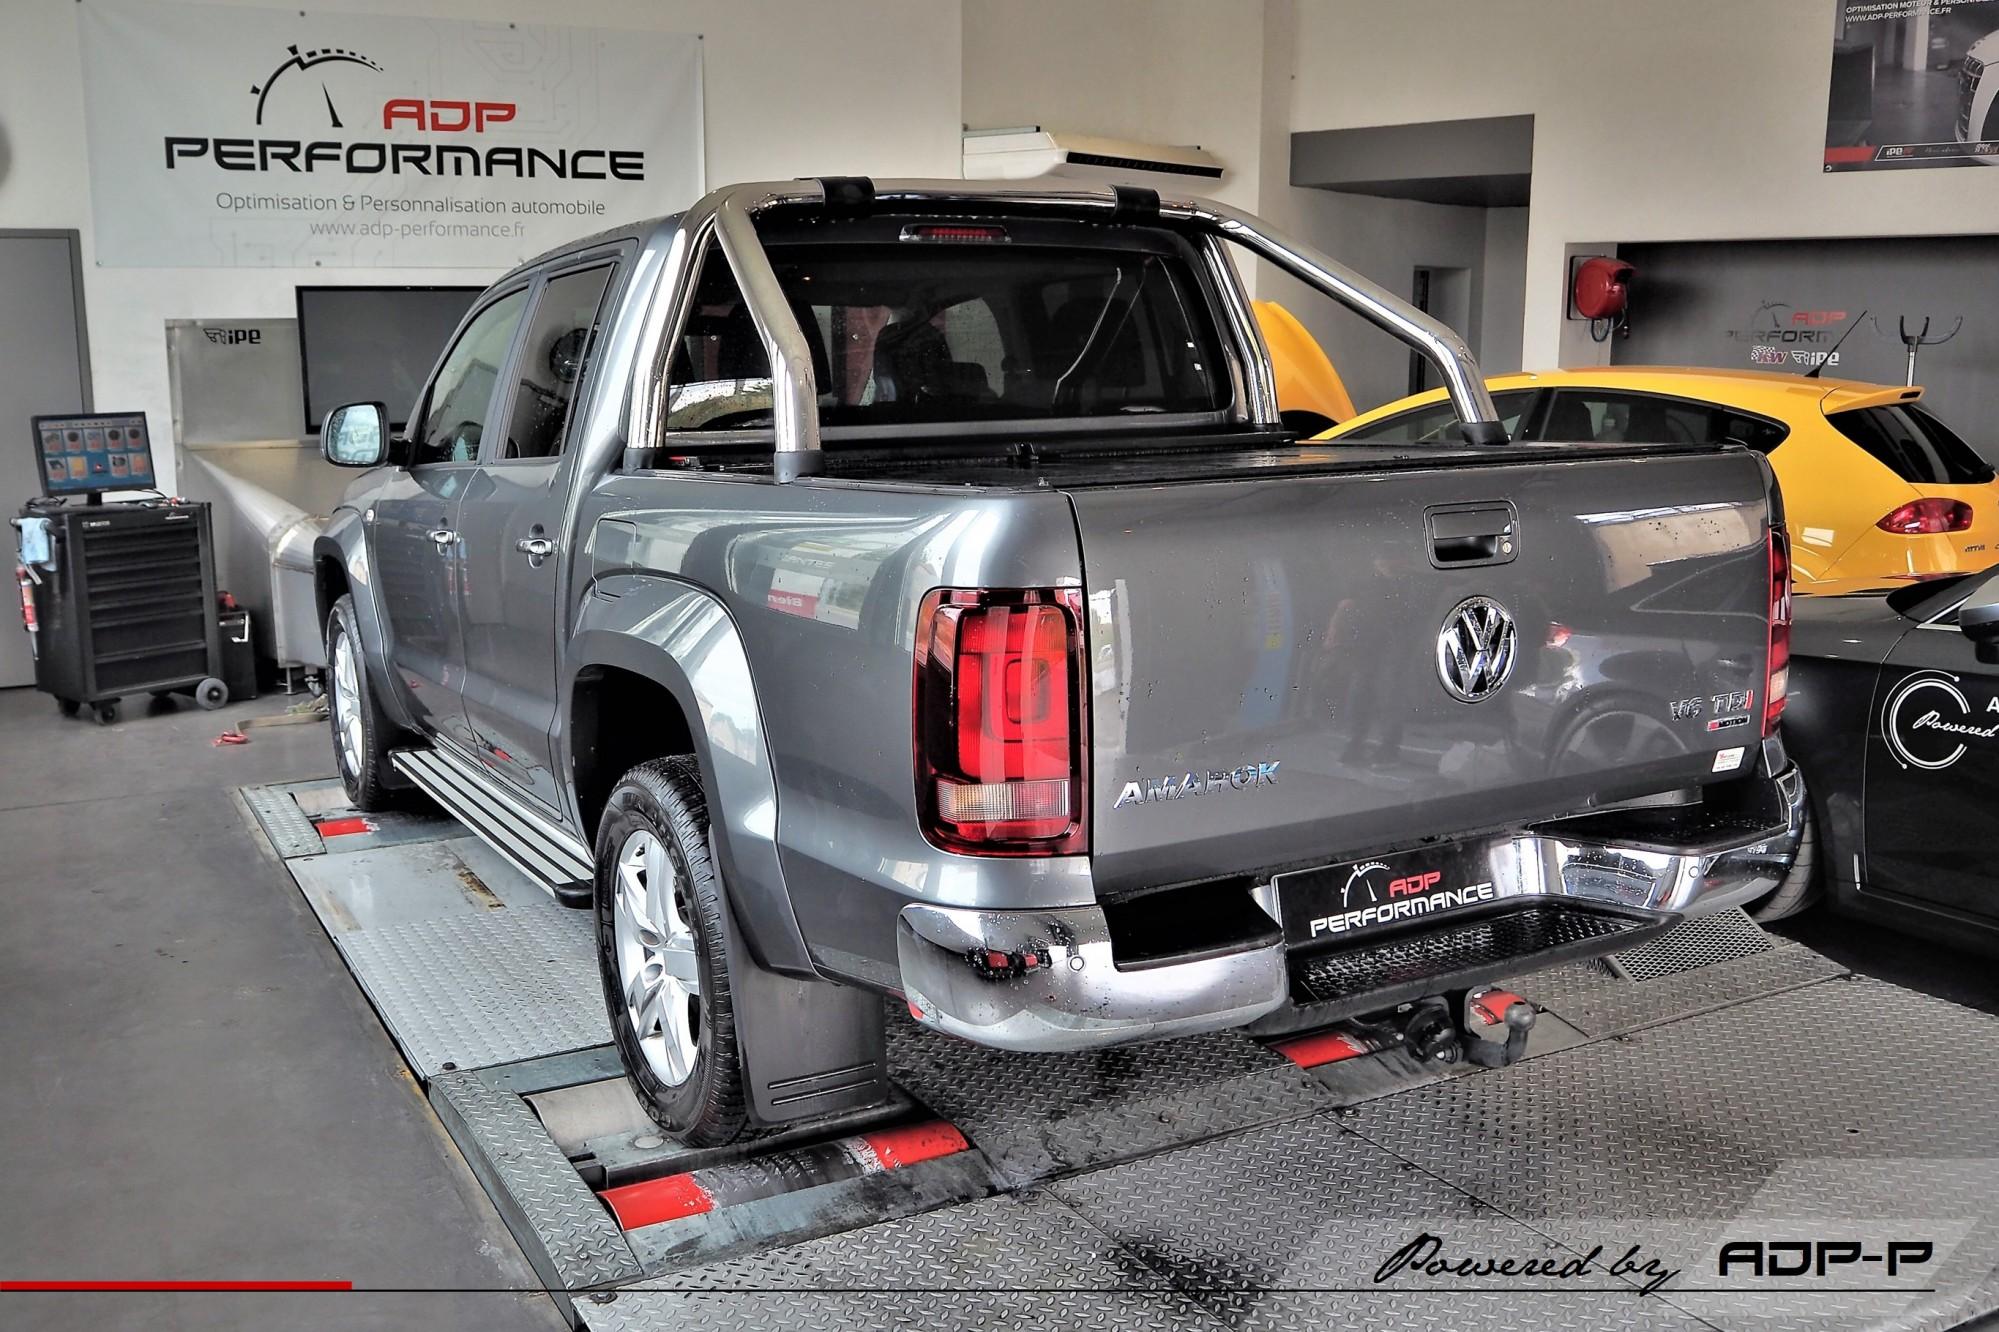 Reprogrammation moteur Aix en Provence - Volkswagen Amarok 3.0 V6 TDI 204cv - ADP Performance